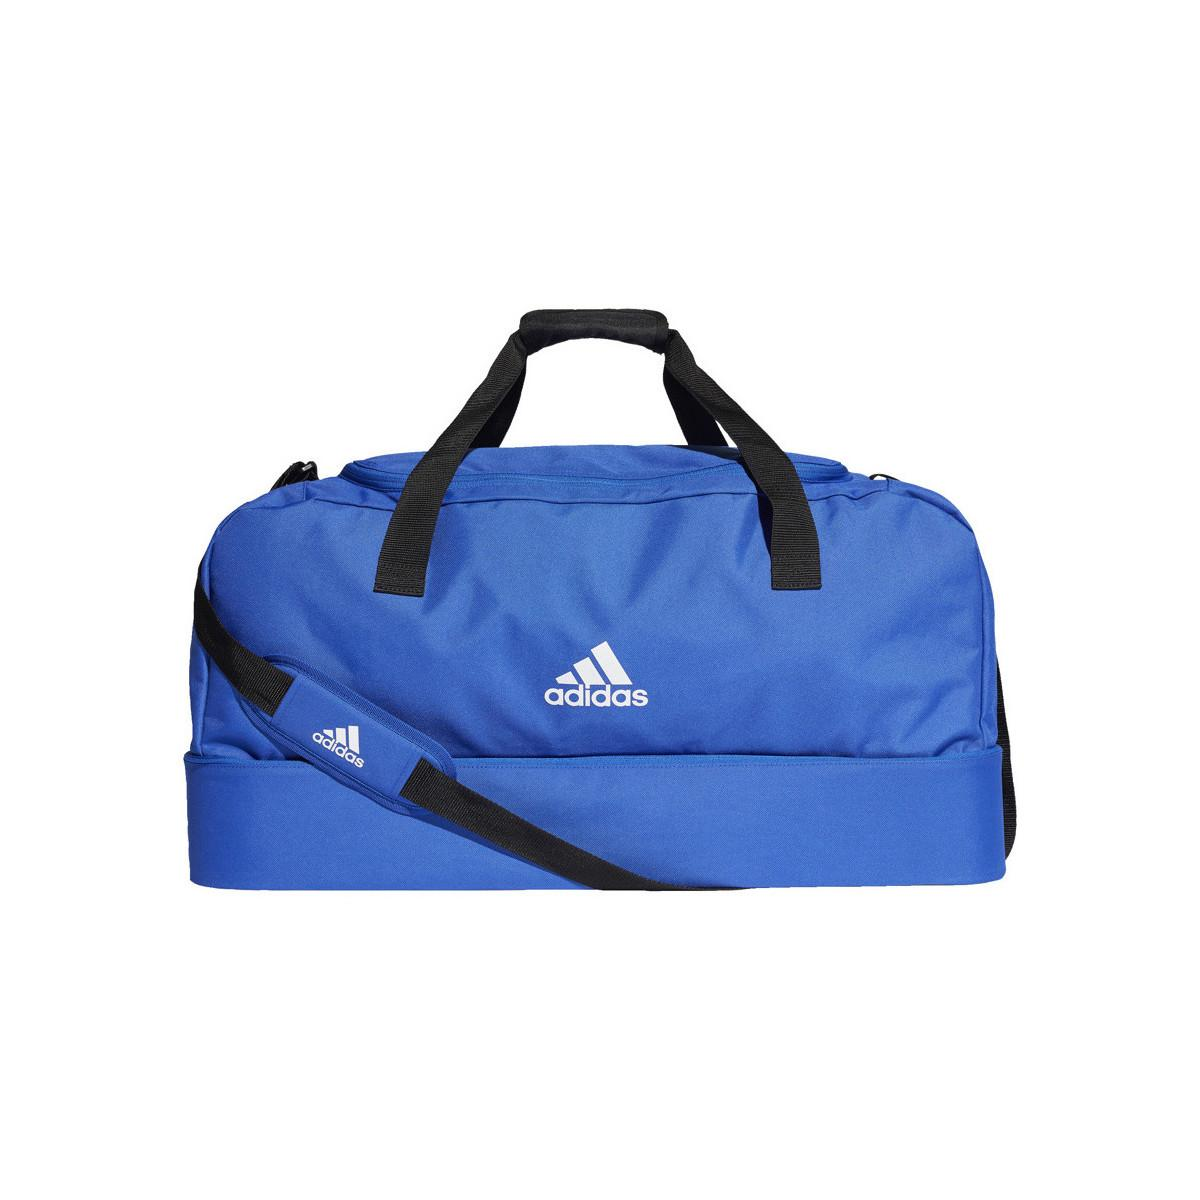 a02bdb2b8b Adidas - Blue Tiro DU BC L hommes Sac de sport en bleu for Men -. Afficher  en plein écran